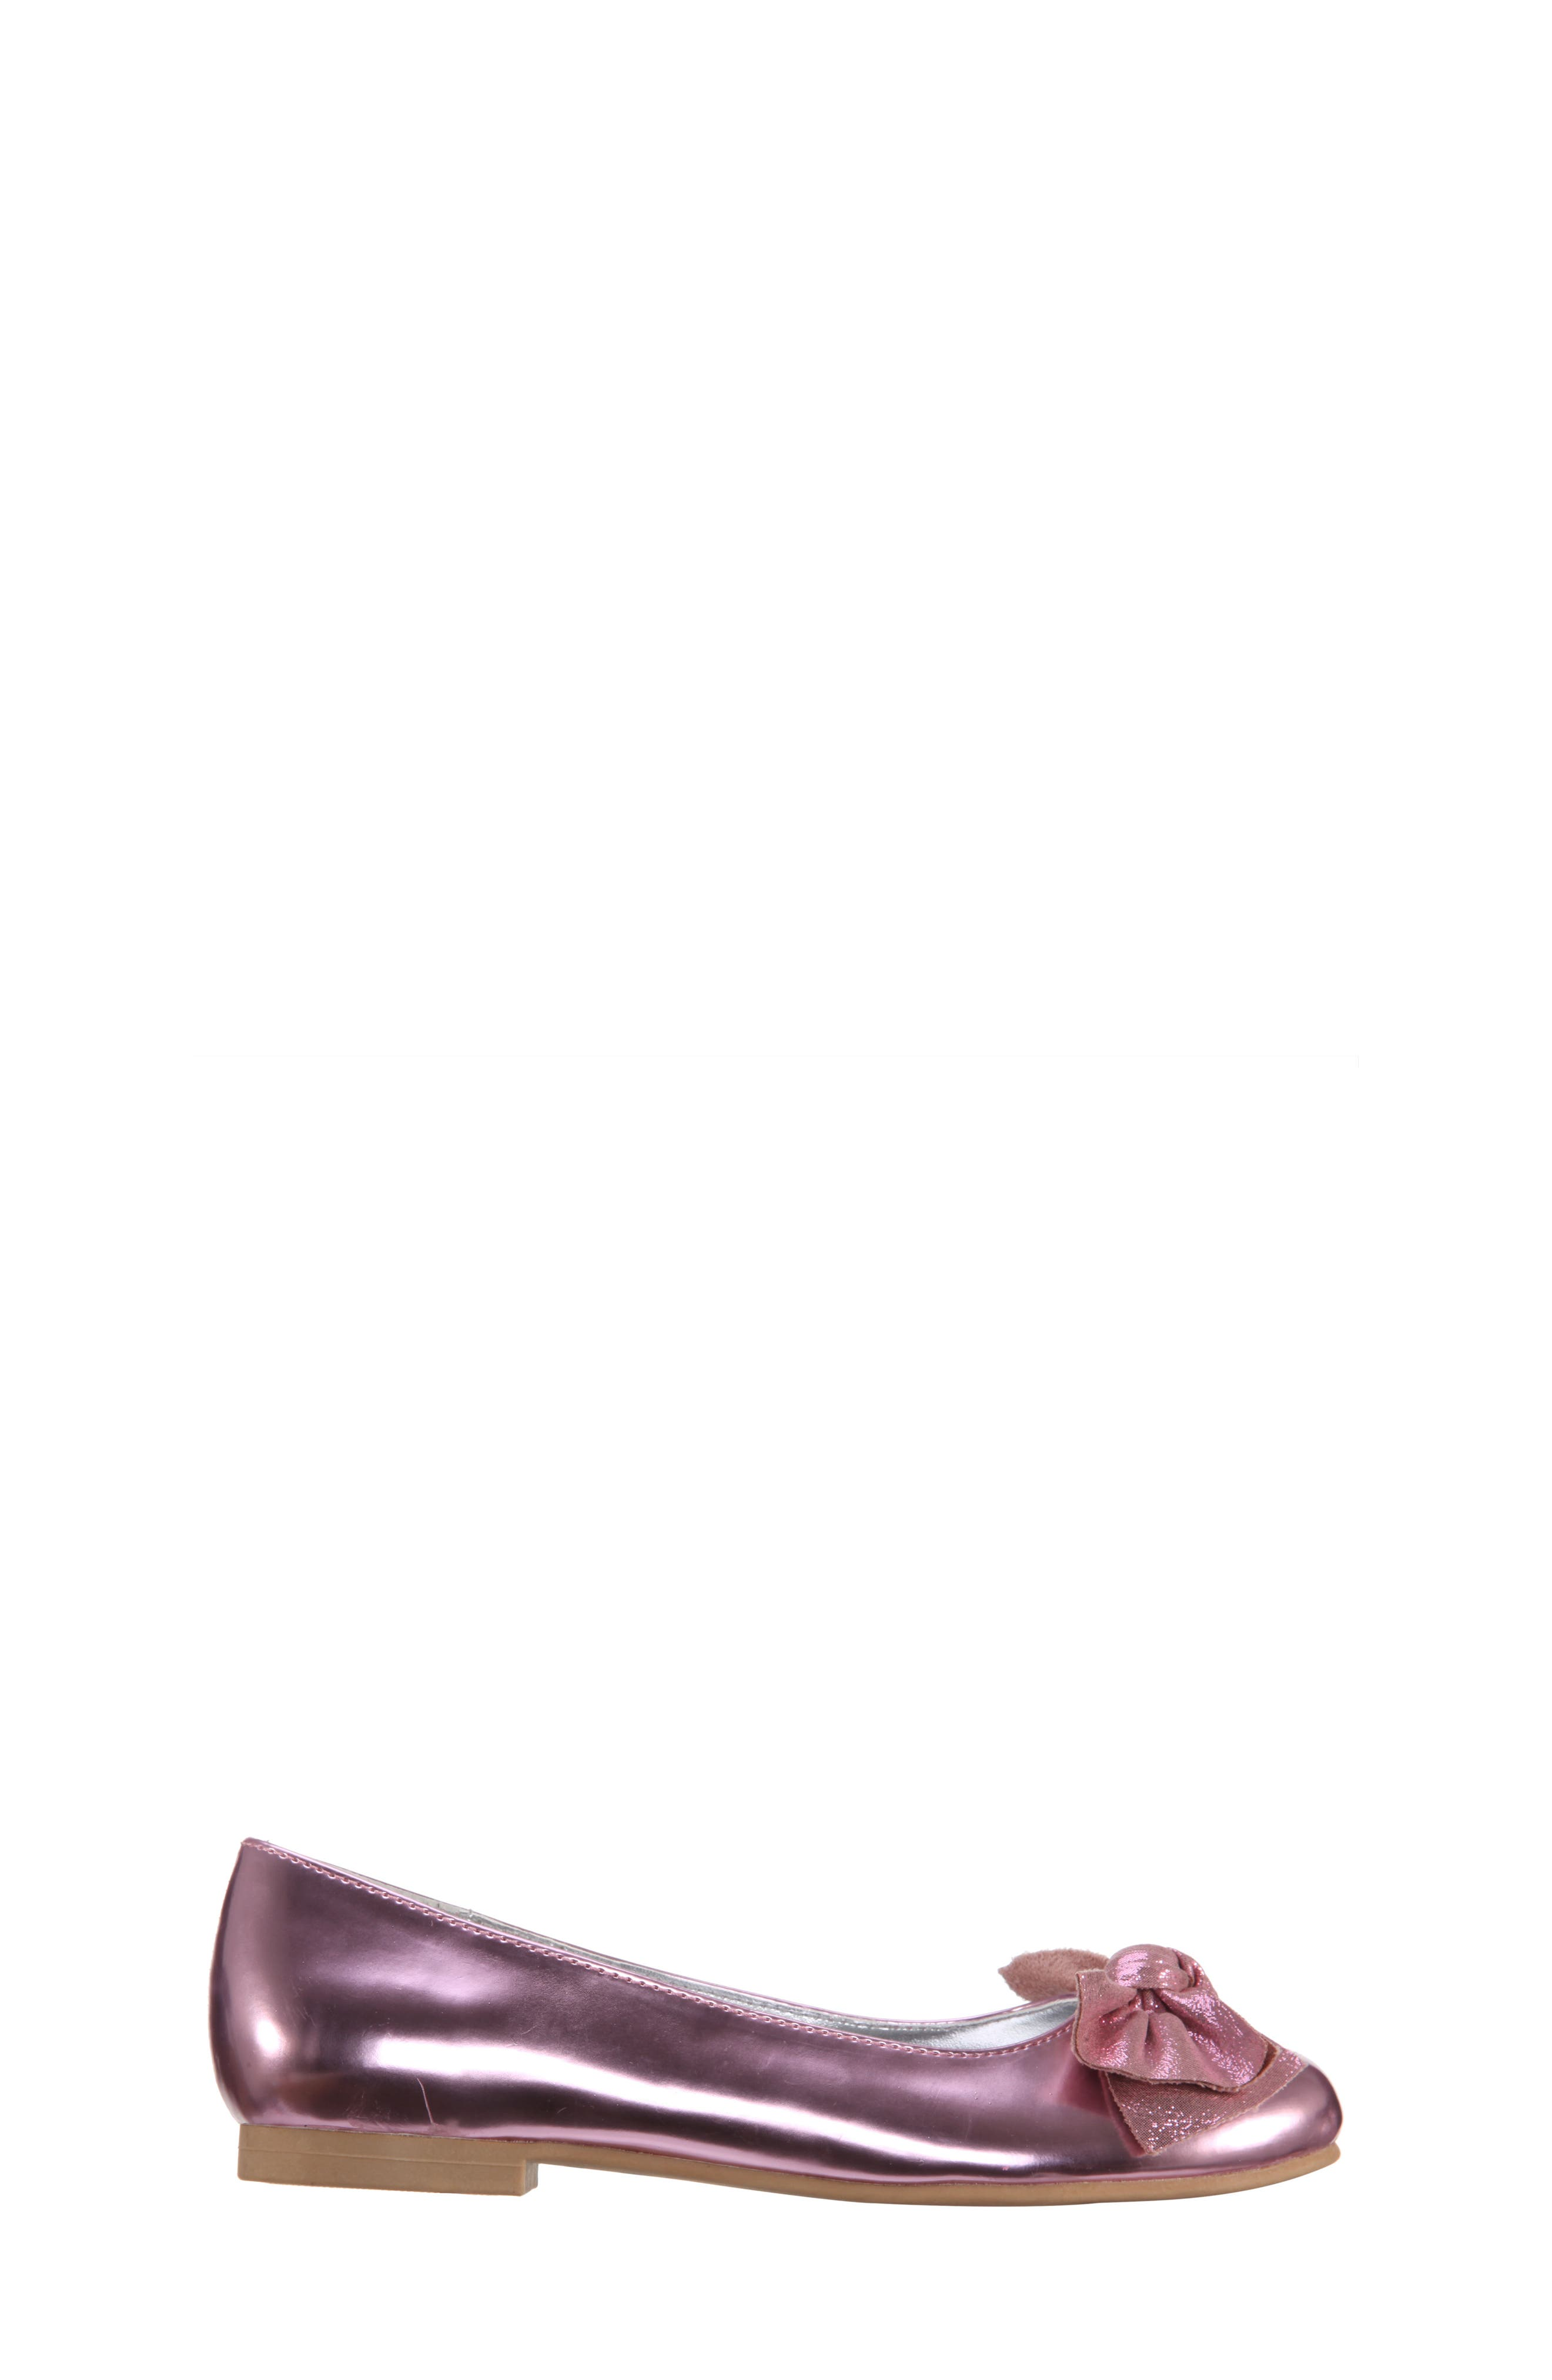 Katelyn Glitter Bow Metallic Ballet Flat,                             Alternate thumbnail 3, color,                             Pink Mirror Metallic